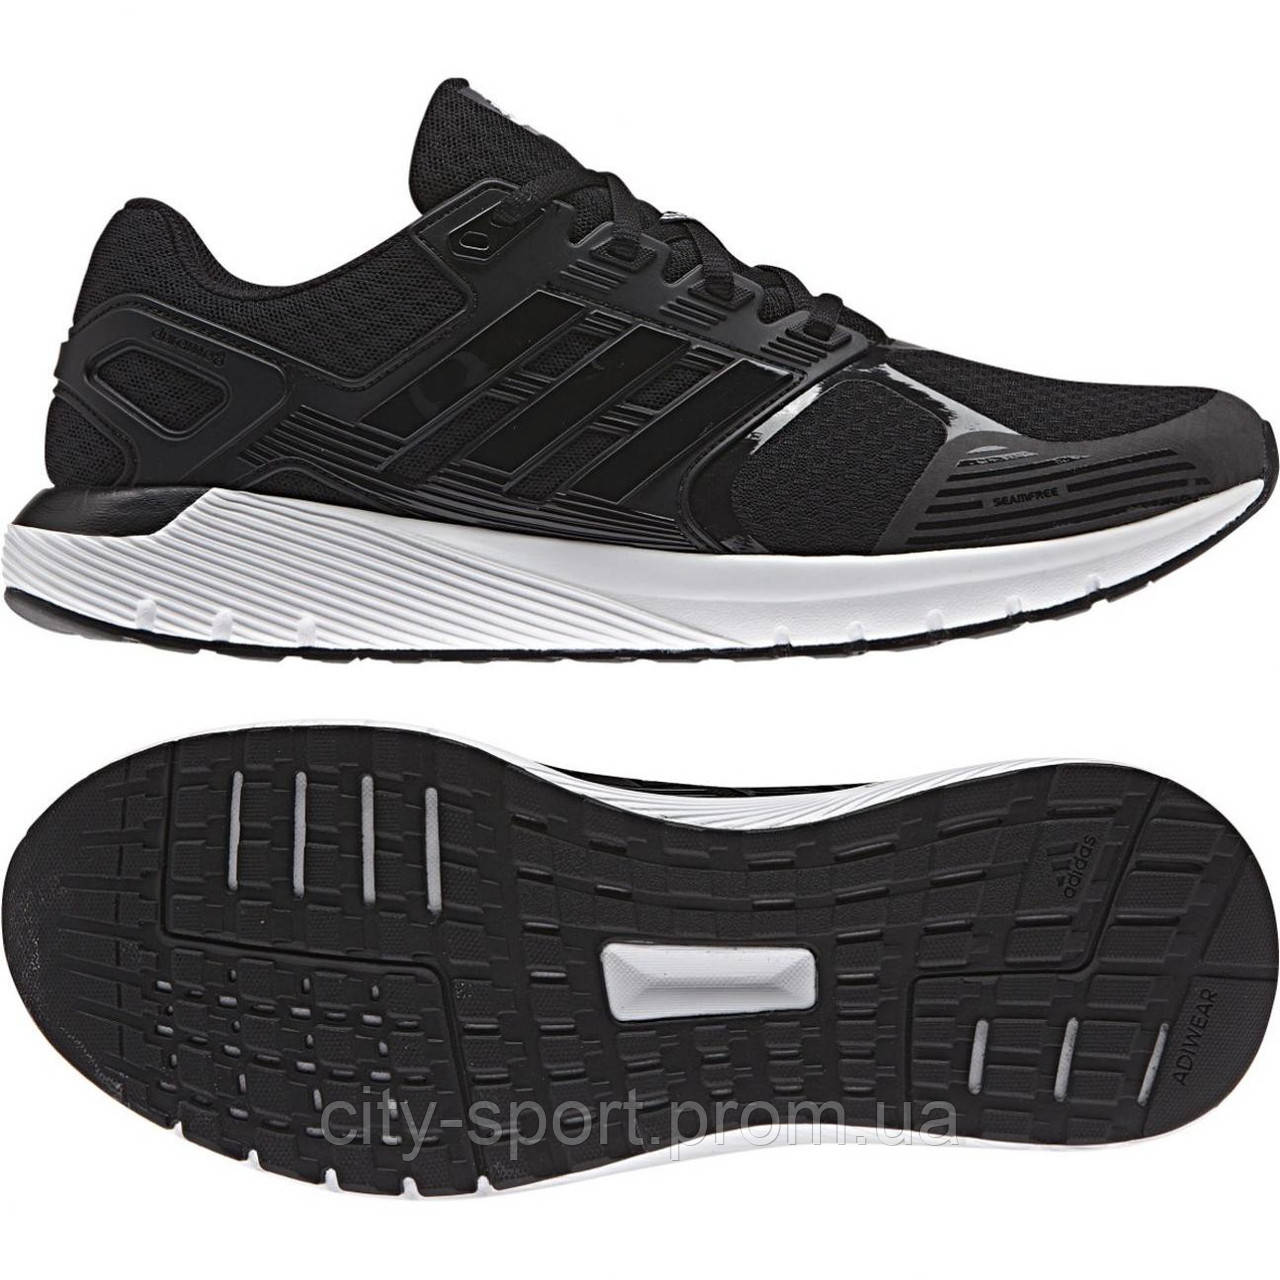 329ef59e Мужские кроссовки Adidas Duramo 8(Арт. BB4655) -